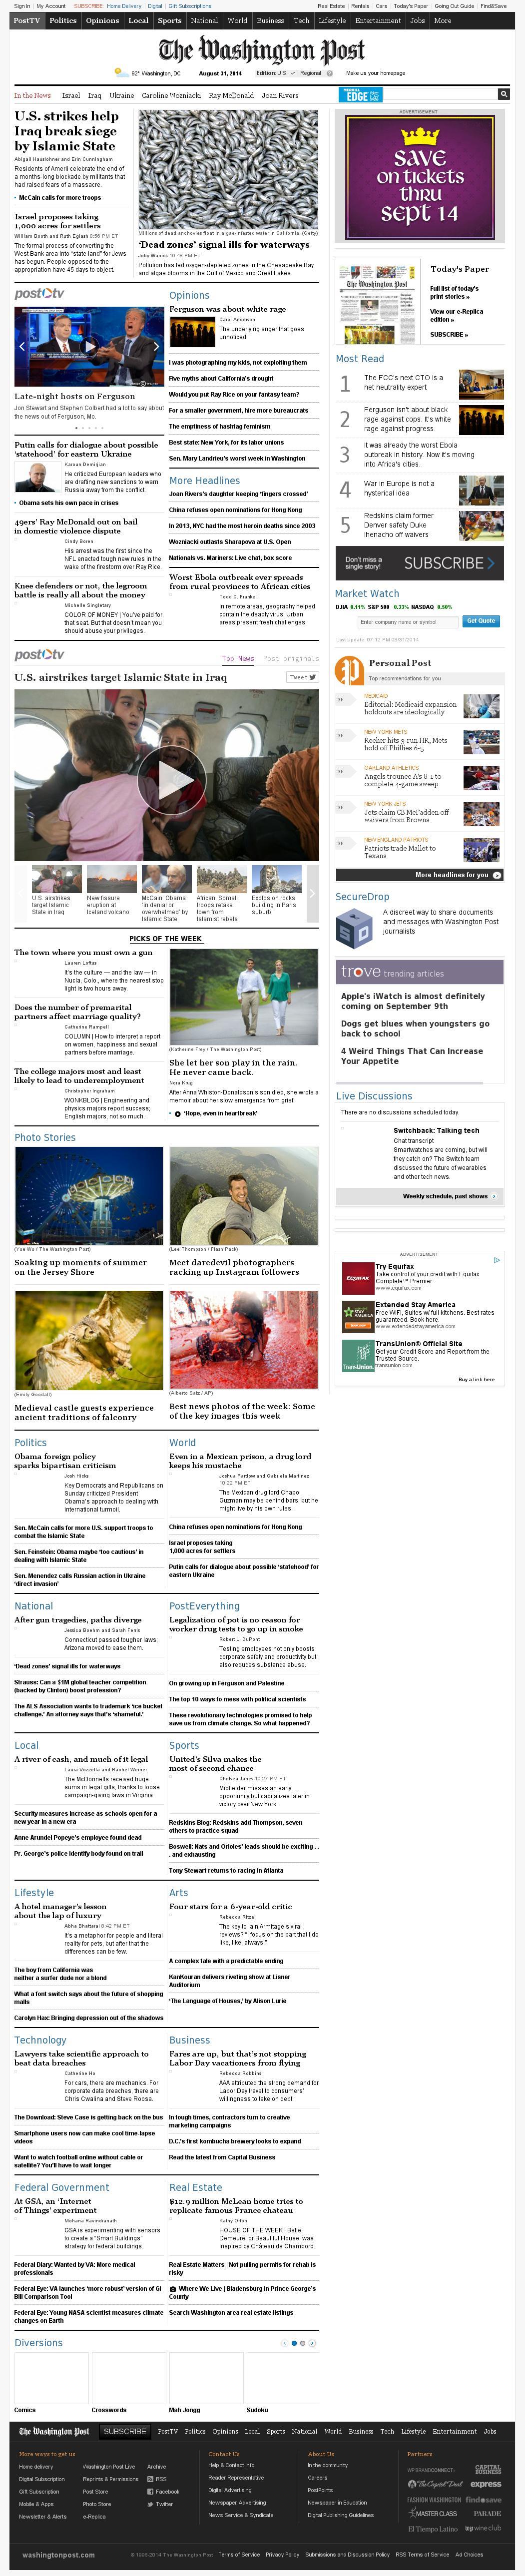 The Washington Post at Sunday Aug. 31, 2014, 11:24 p.m. UTC